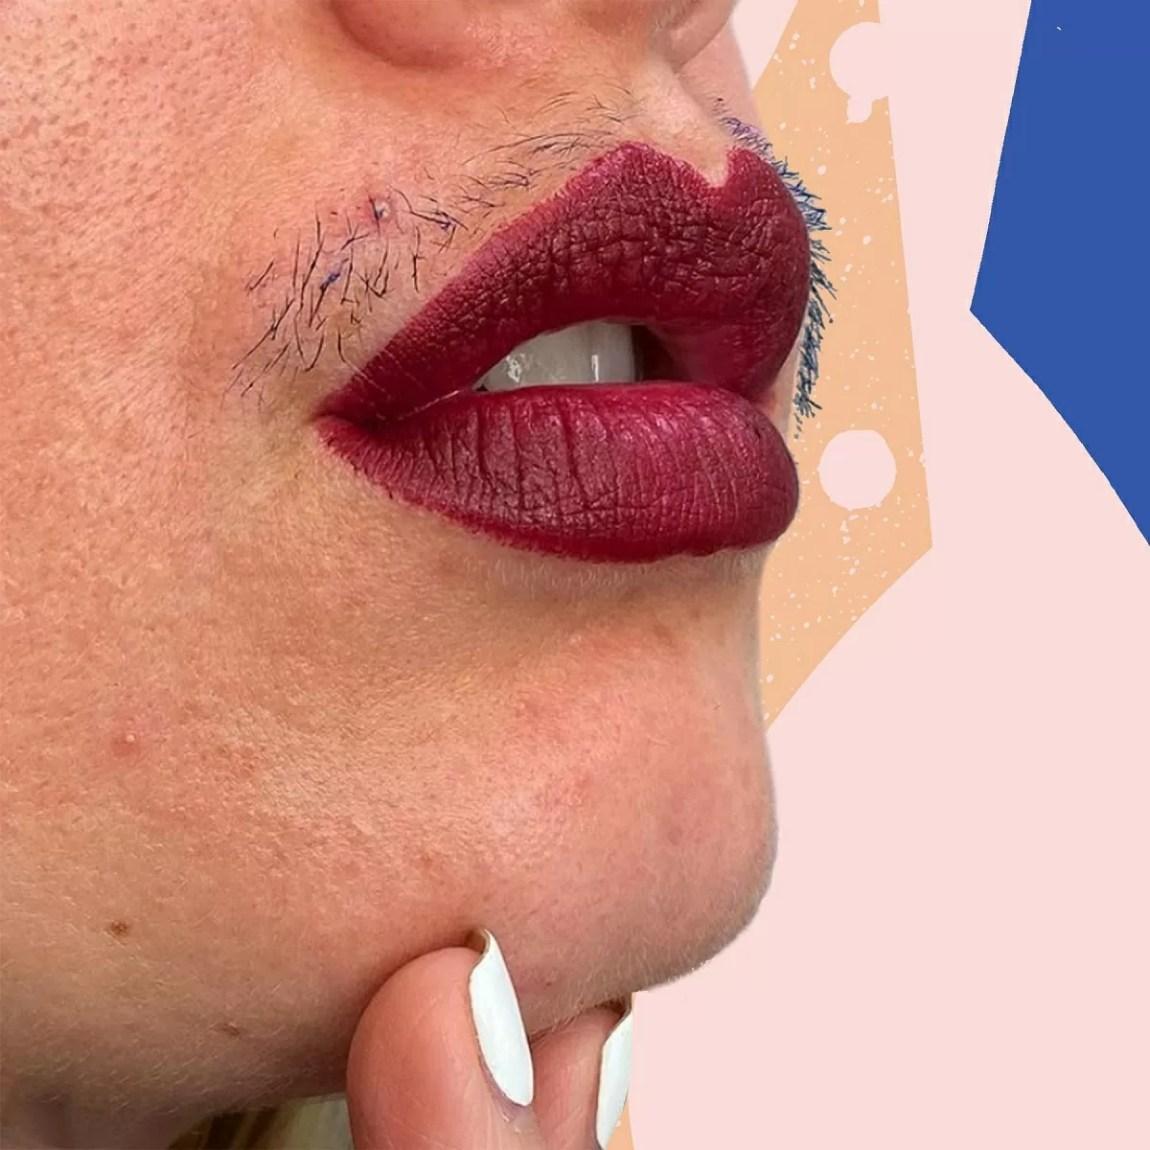 mustache and mascara